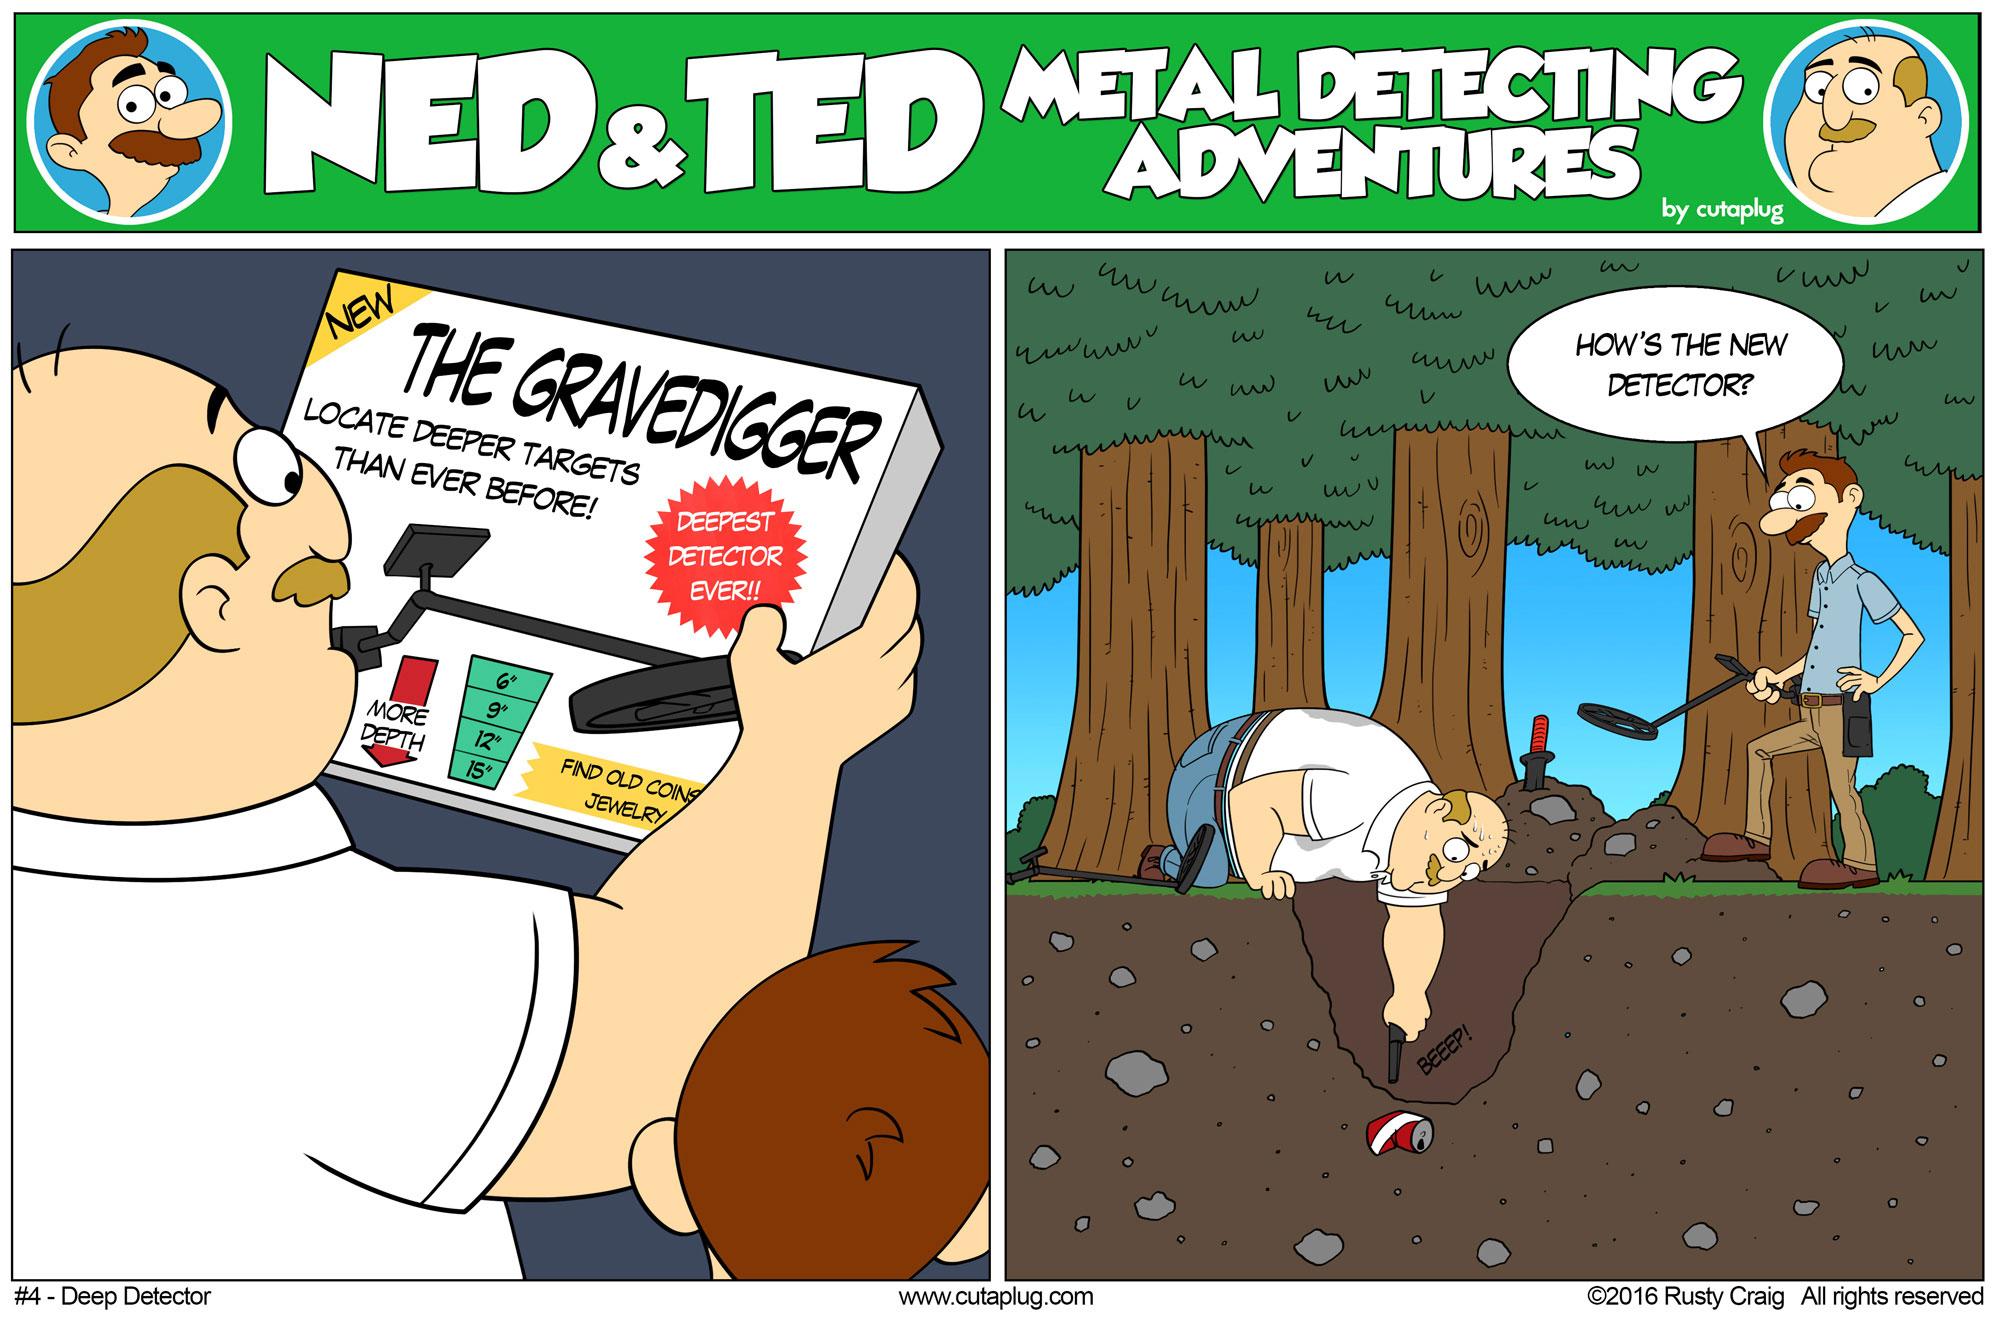 Ned and Ted Metal detecting comics | Metal detecting cartoons